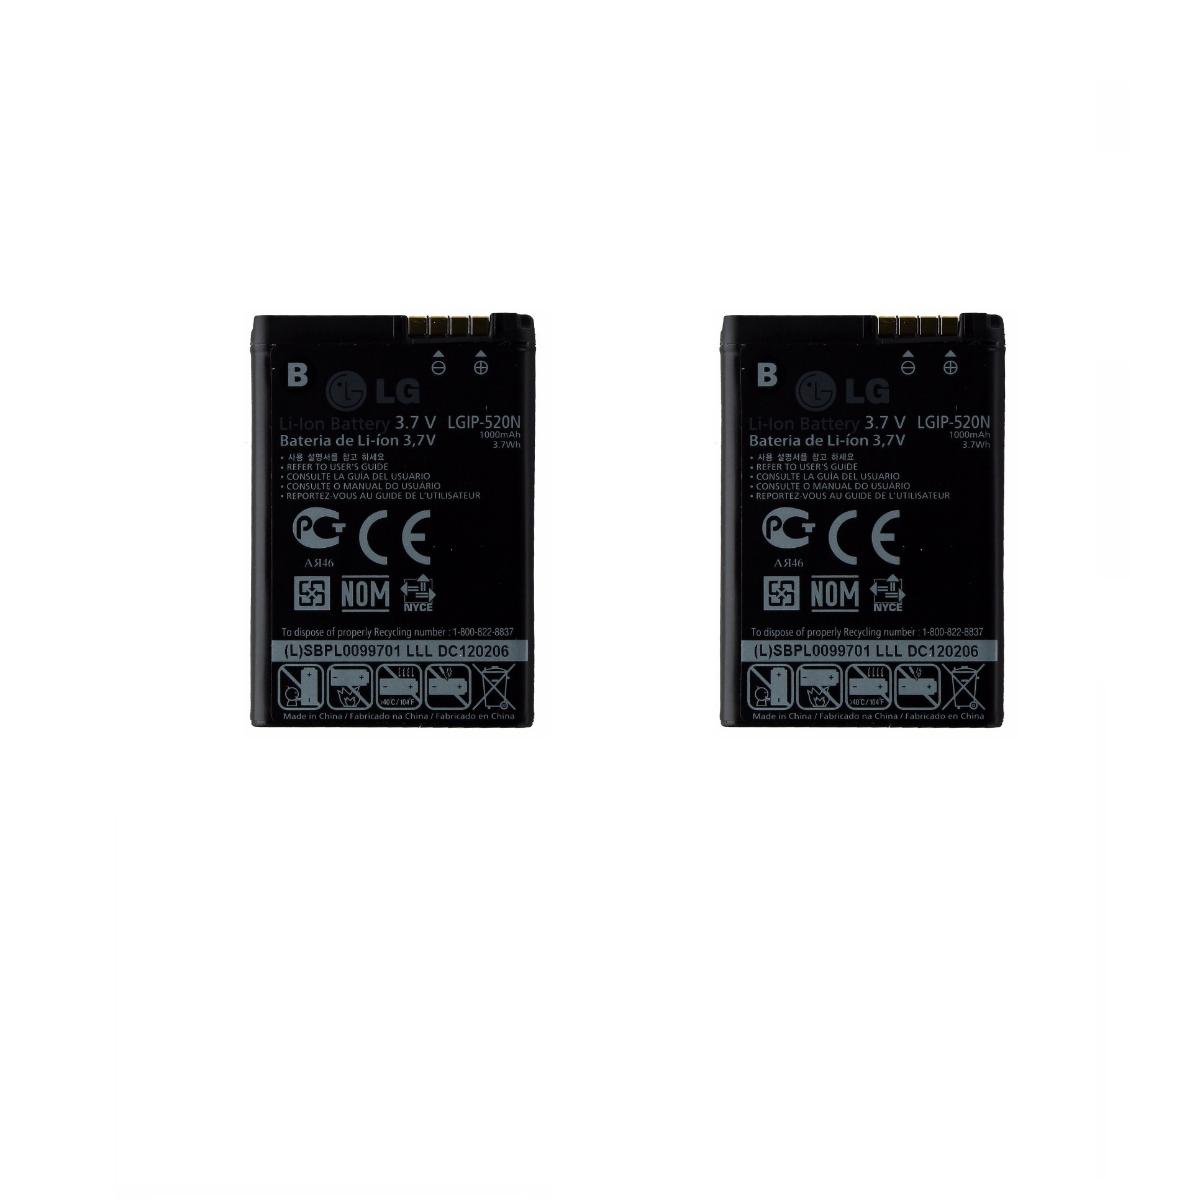 KIT 2x 1000 mAh Replacement Battery (LGIP-520N) for LG Chocolate / GD900 / GW505